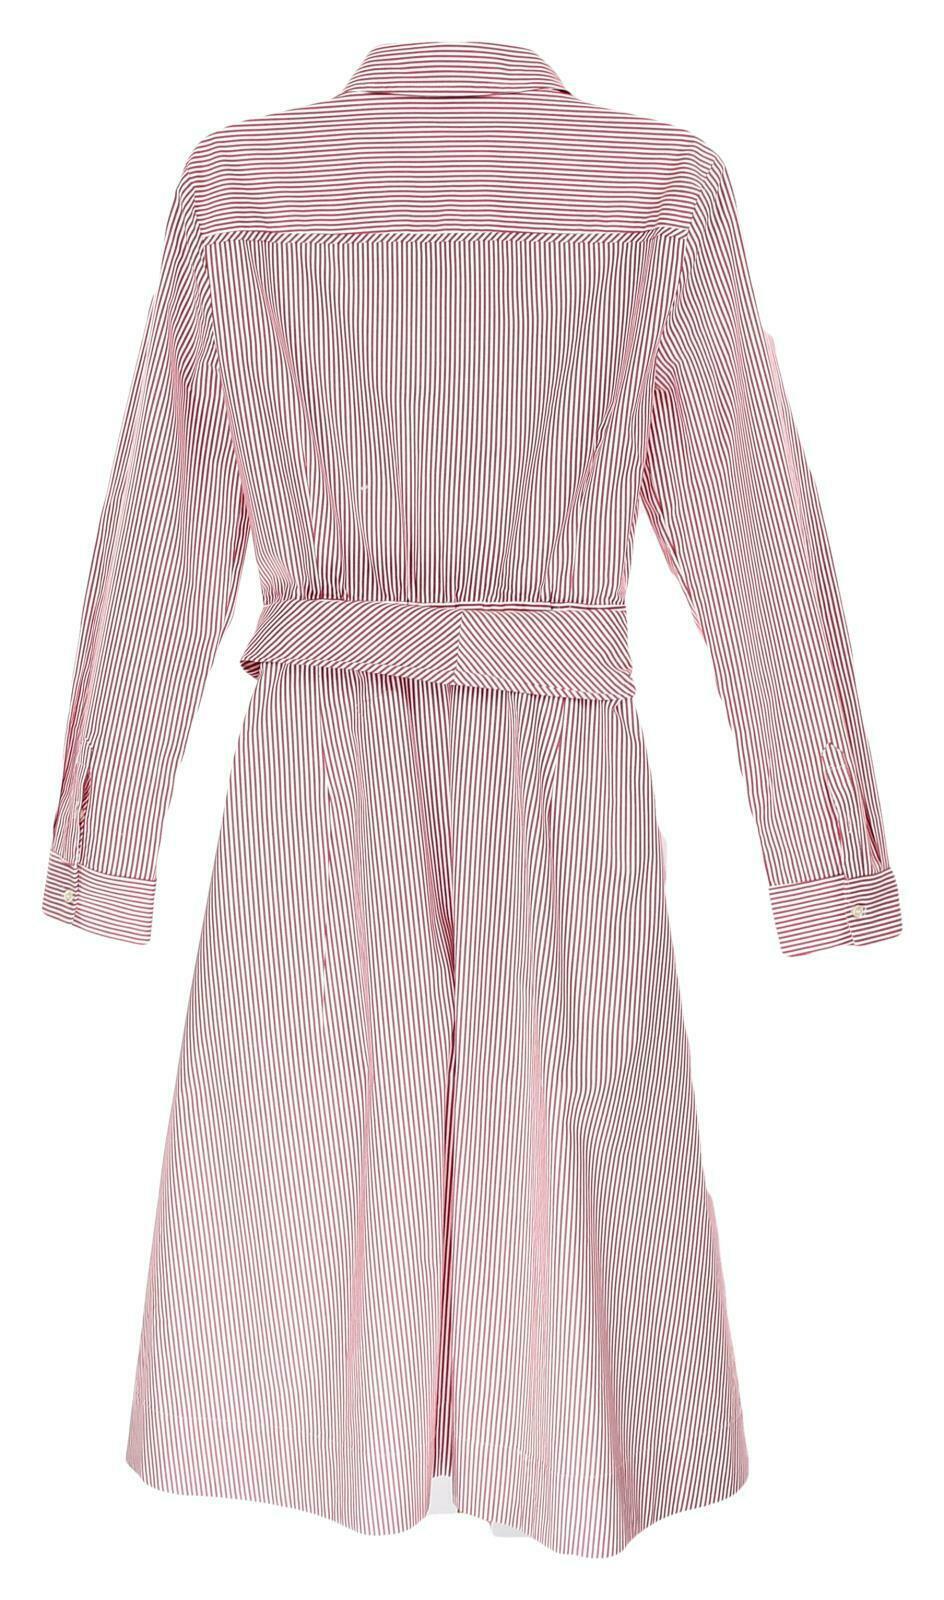 JCrew Womens Tie Waist Shirt Dress Red White Stripes Button Front Dress 14 H7791 image 4